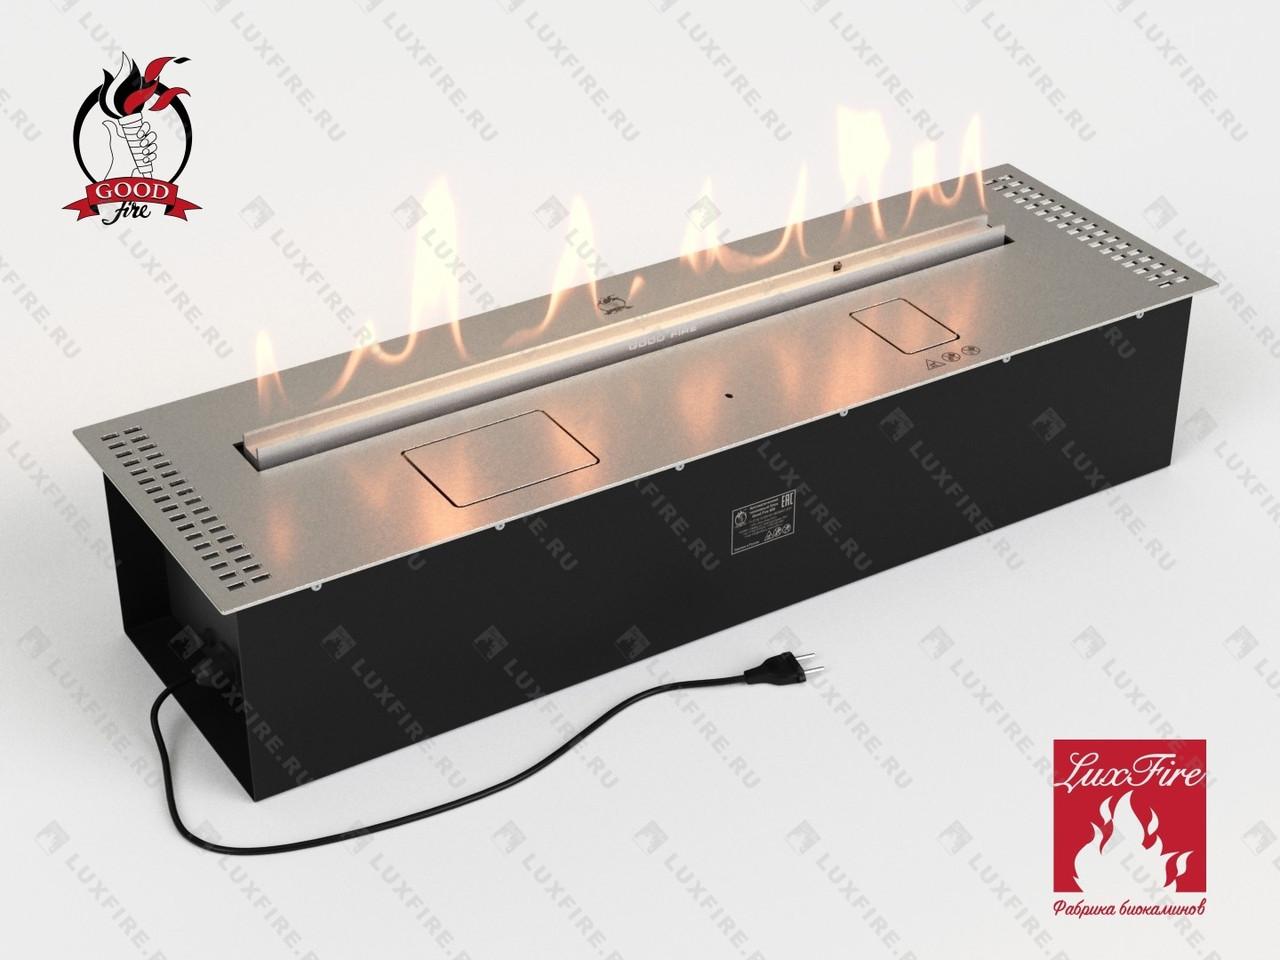 Автоматический биокамин Good Fire 900 INOX